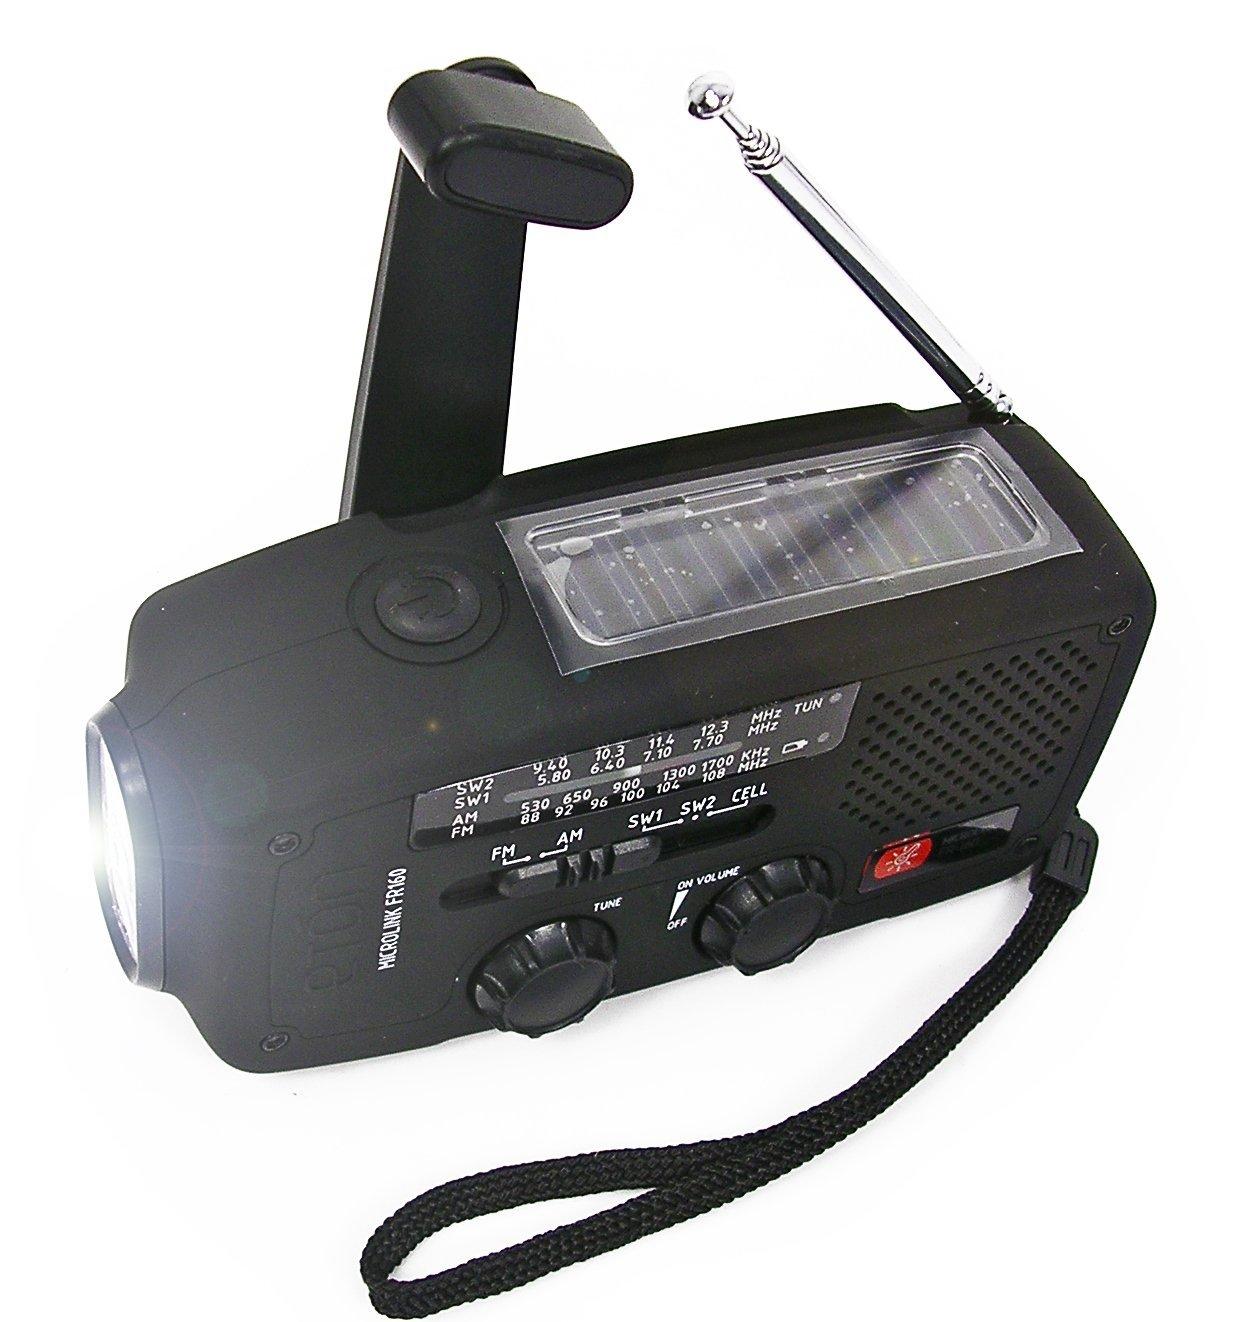 Đài radio Eton Microlink FR-160 AM/FM Flashlight, Solar